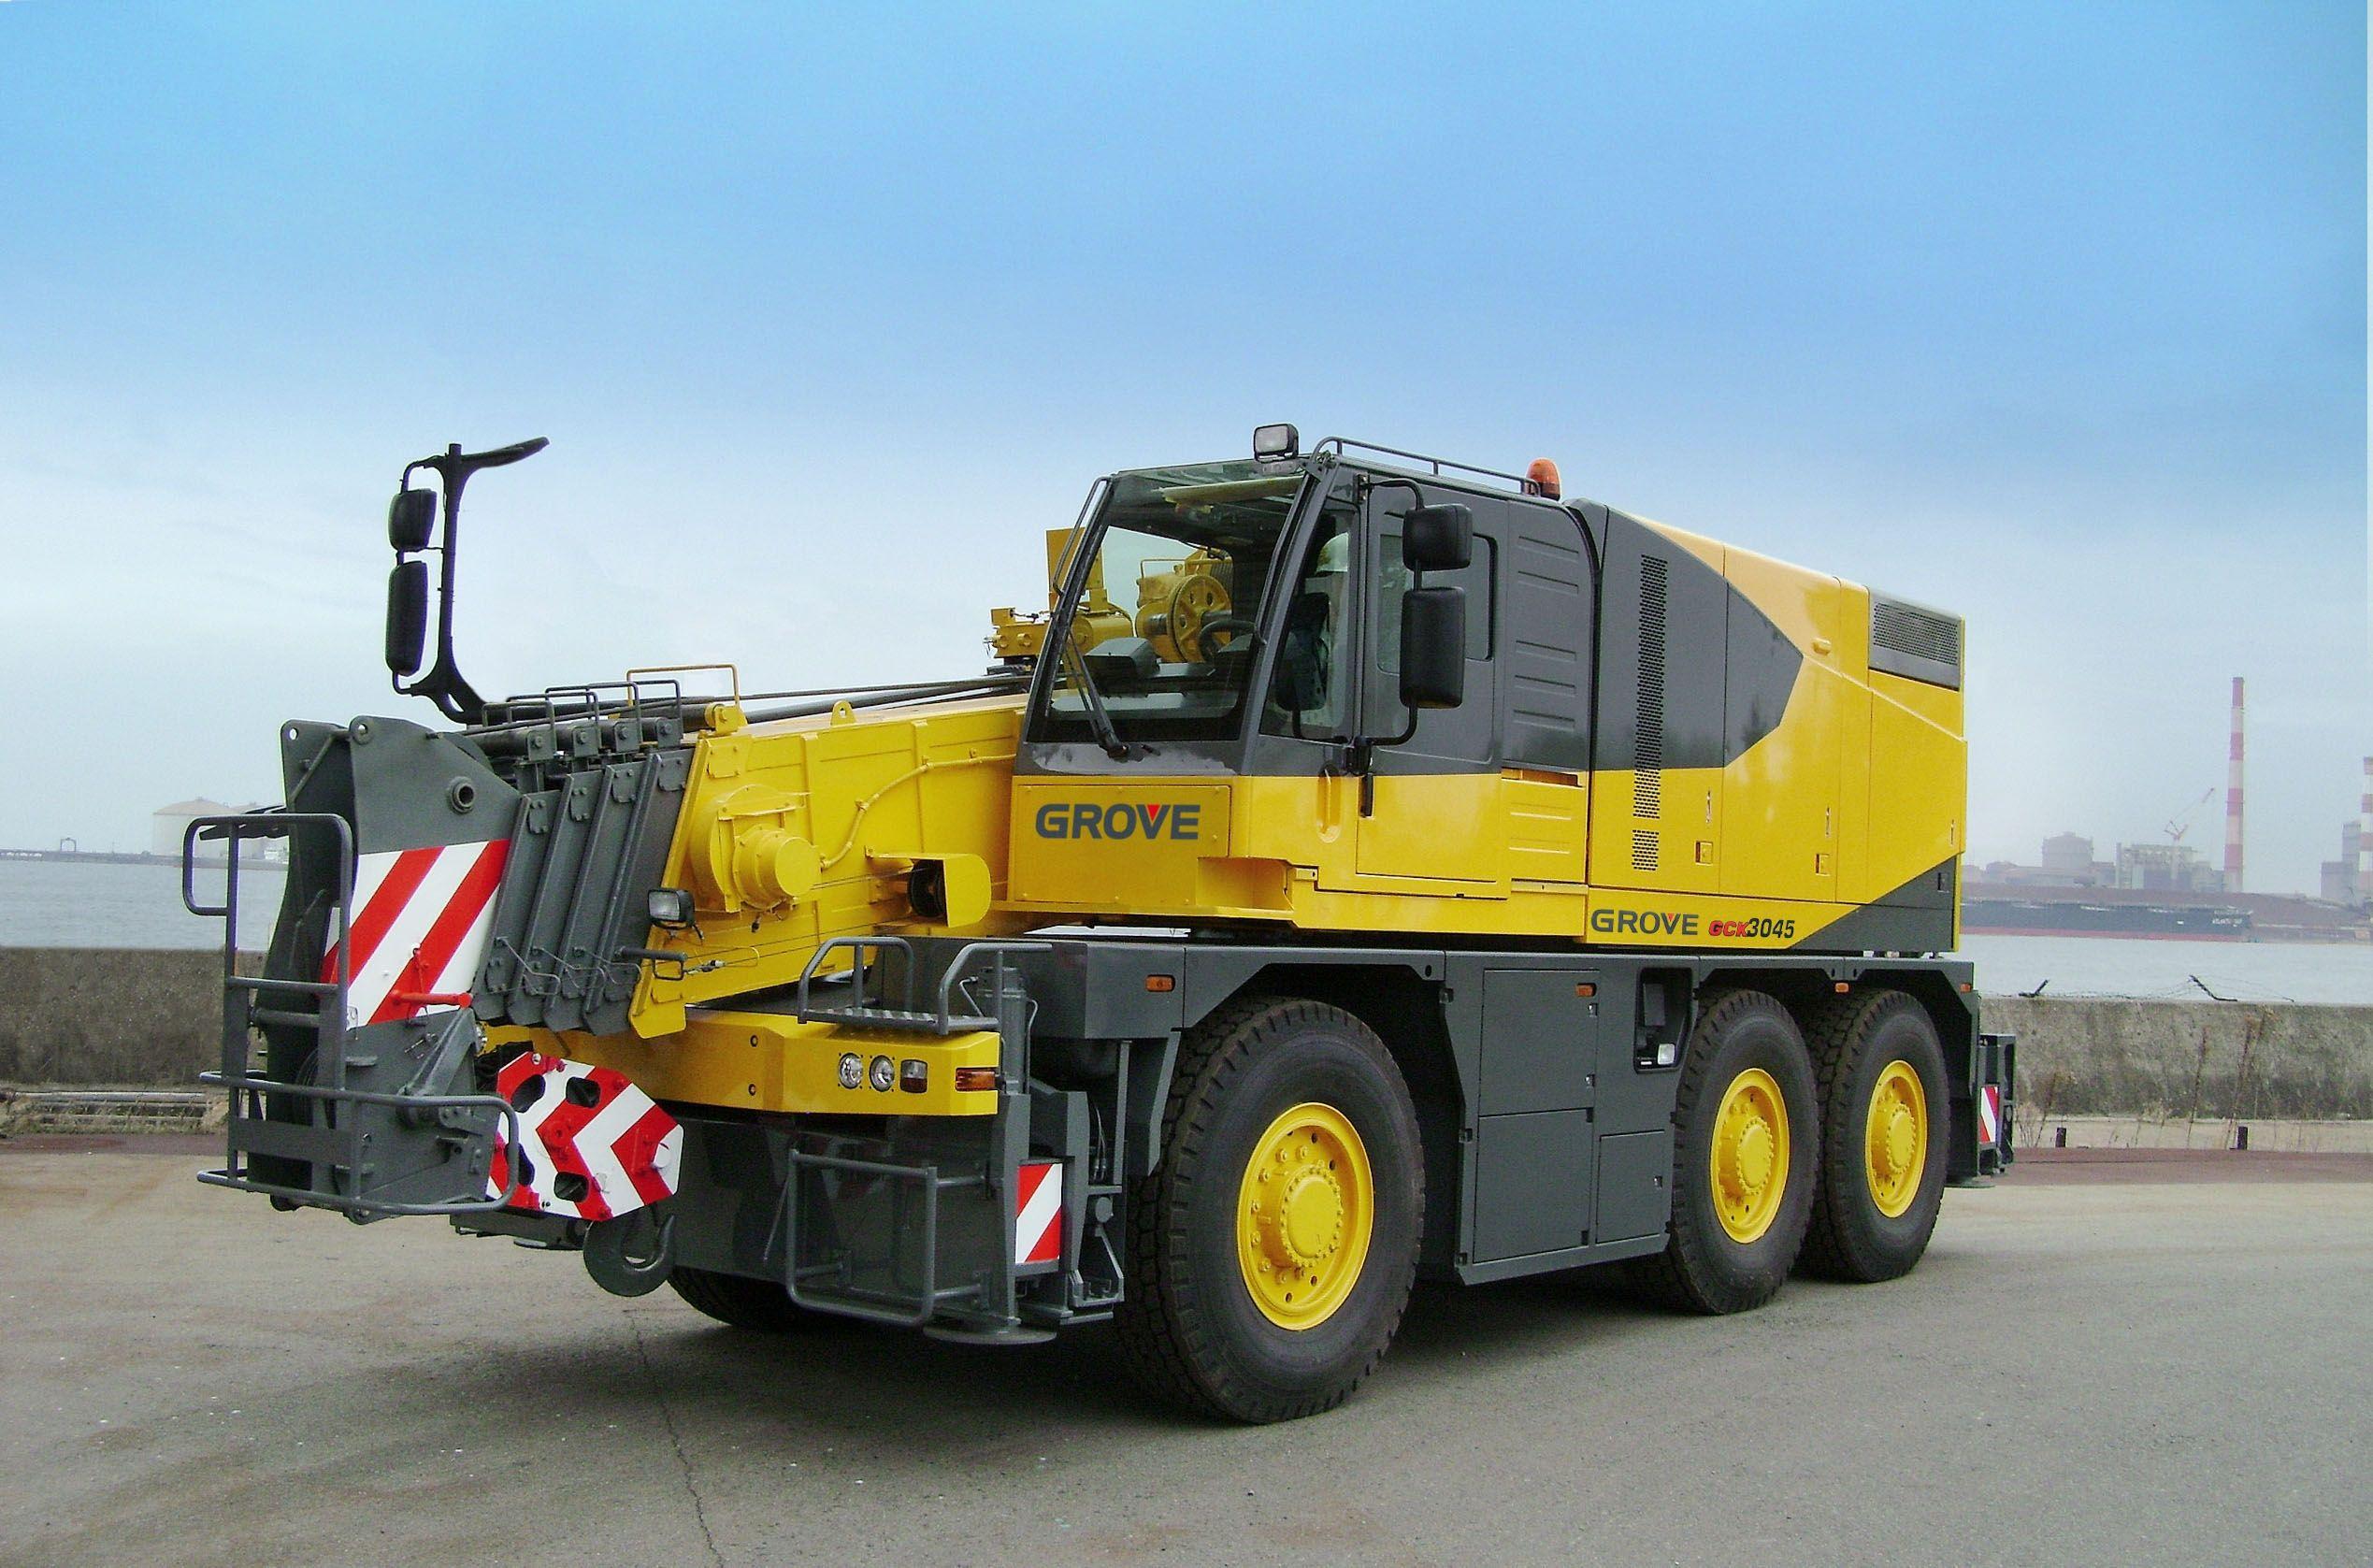 Grove 3045 all terrain mobile crane cranes pinterest for Crane grove